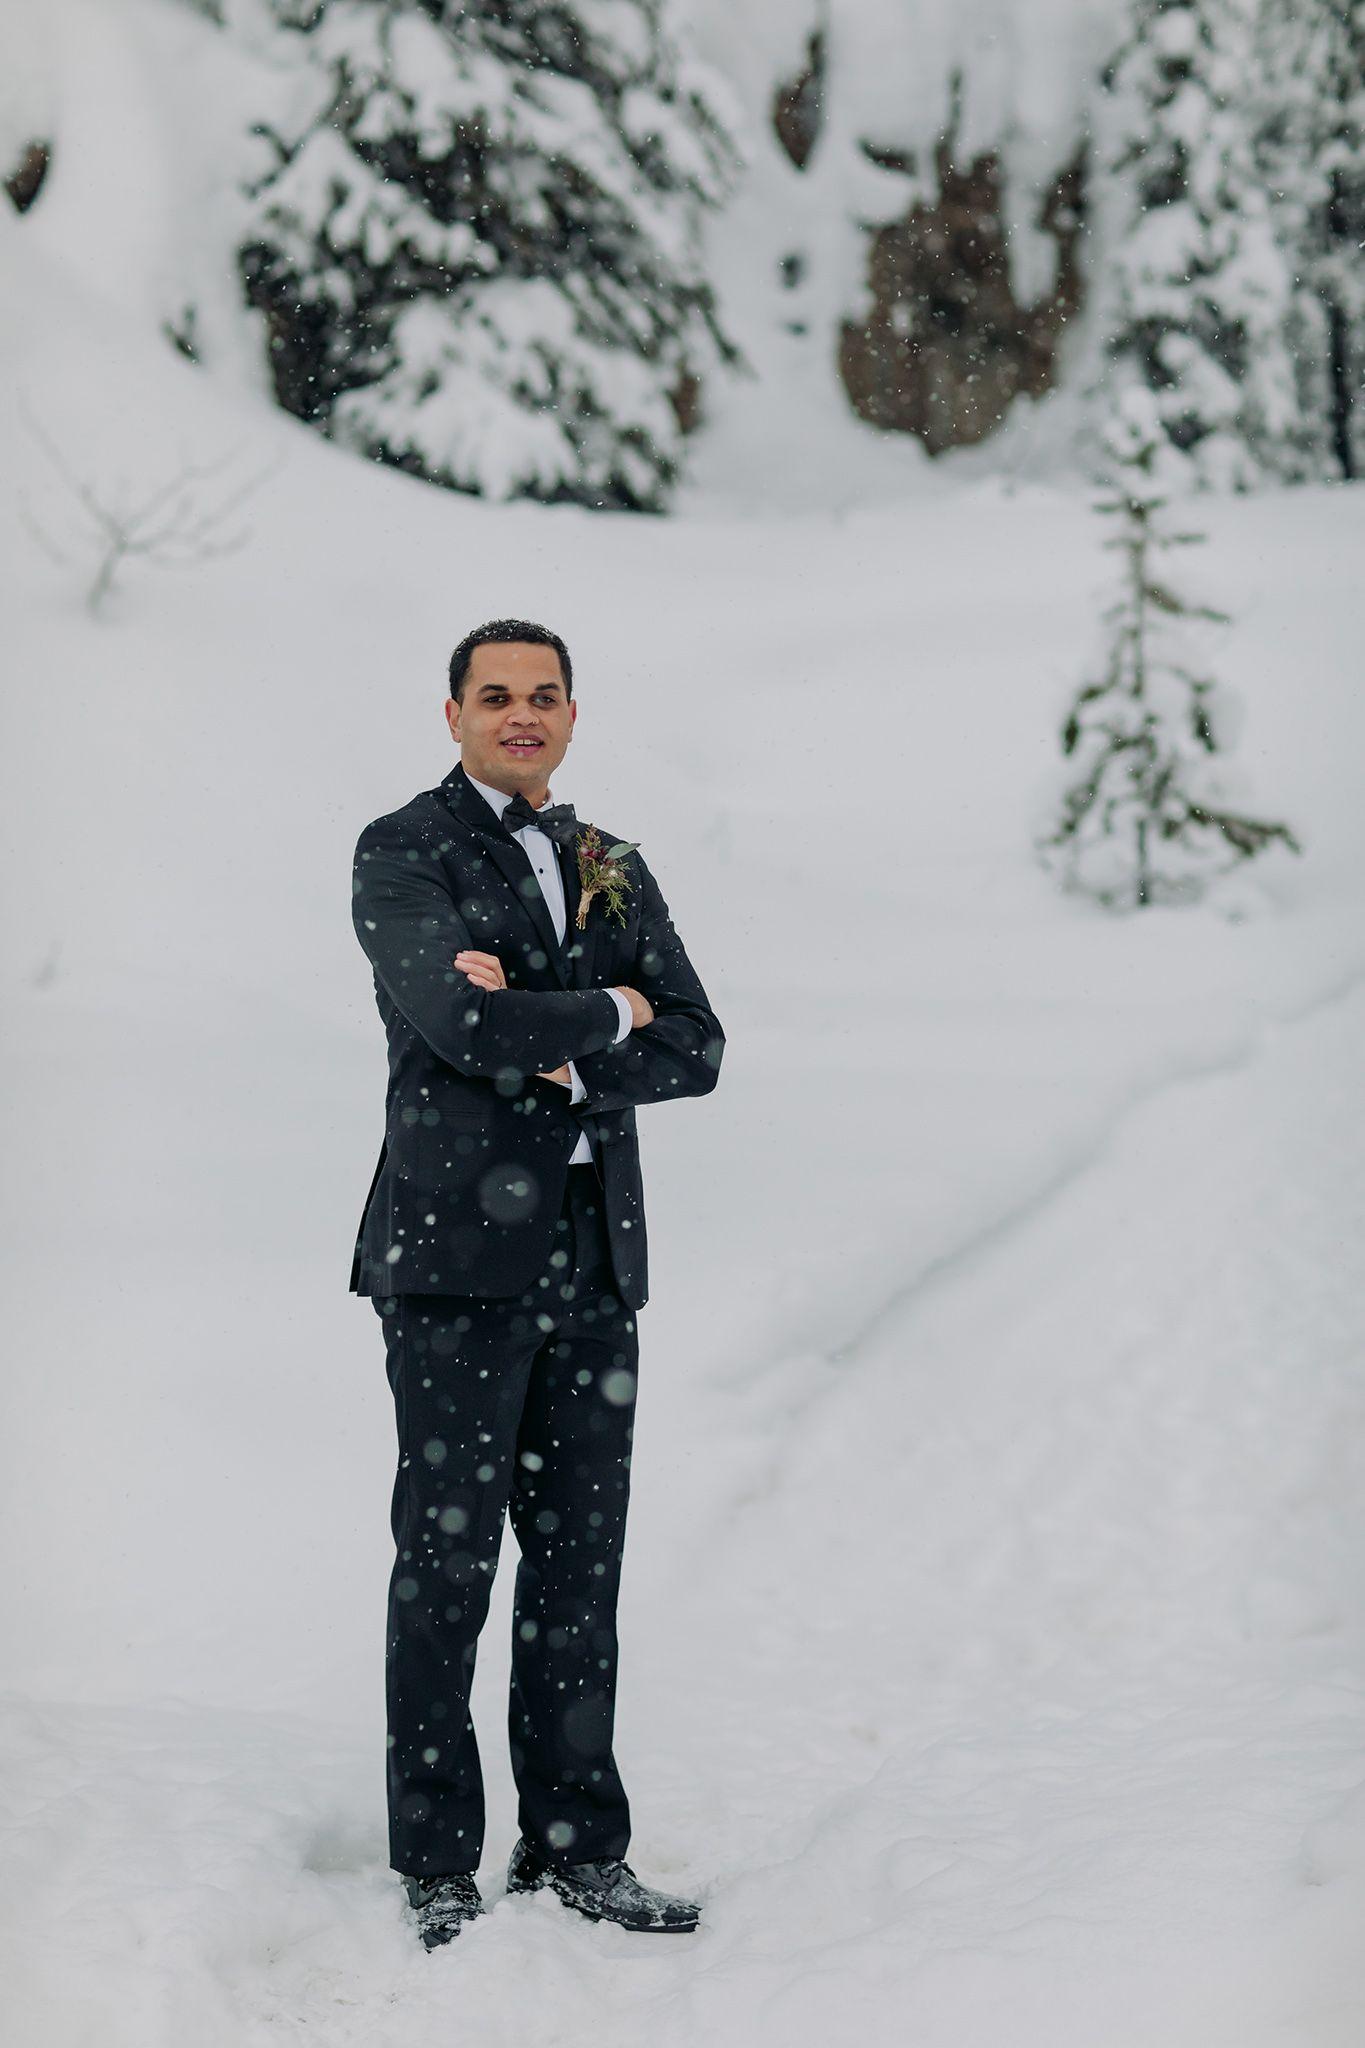 Real Life Snow Globe Emerald Lake Lodge winter wedding ...